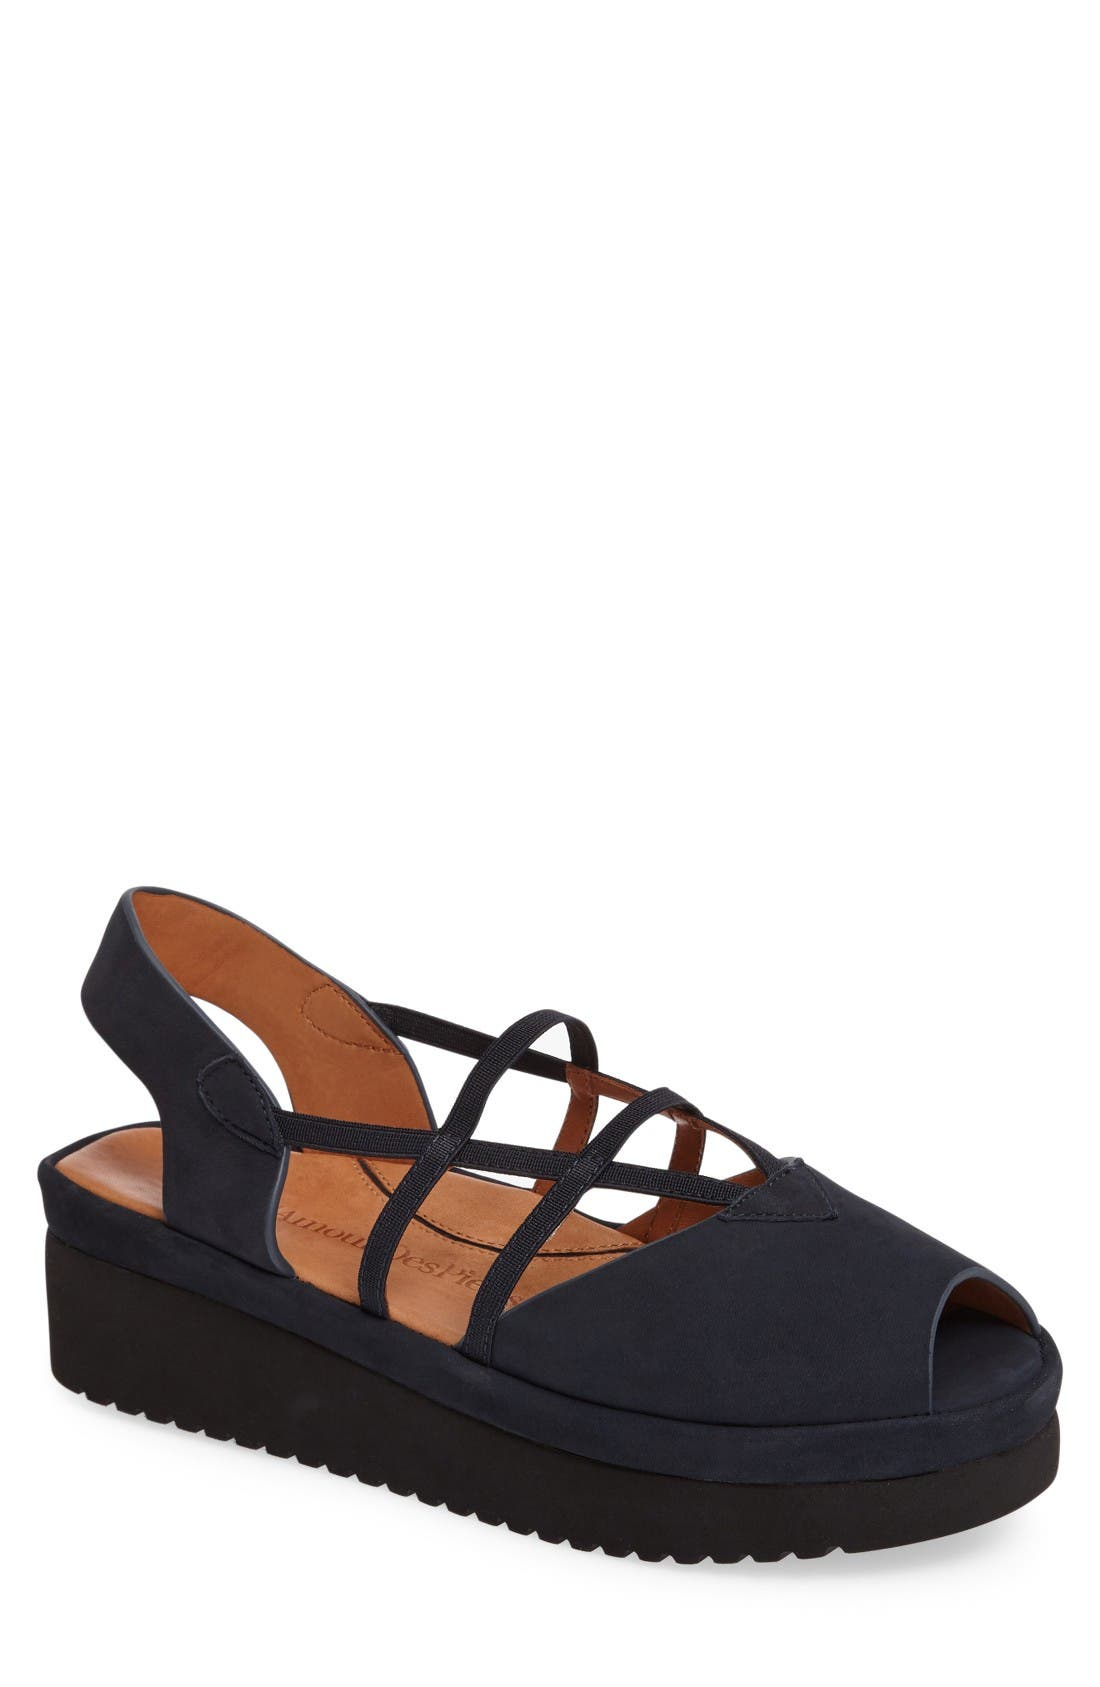 Alternate Image 1 Selected - L'Amour des Pieds Adelais Platform Wedge Sandal (Women)